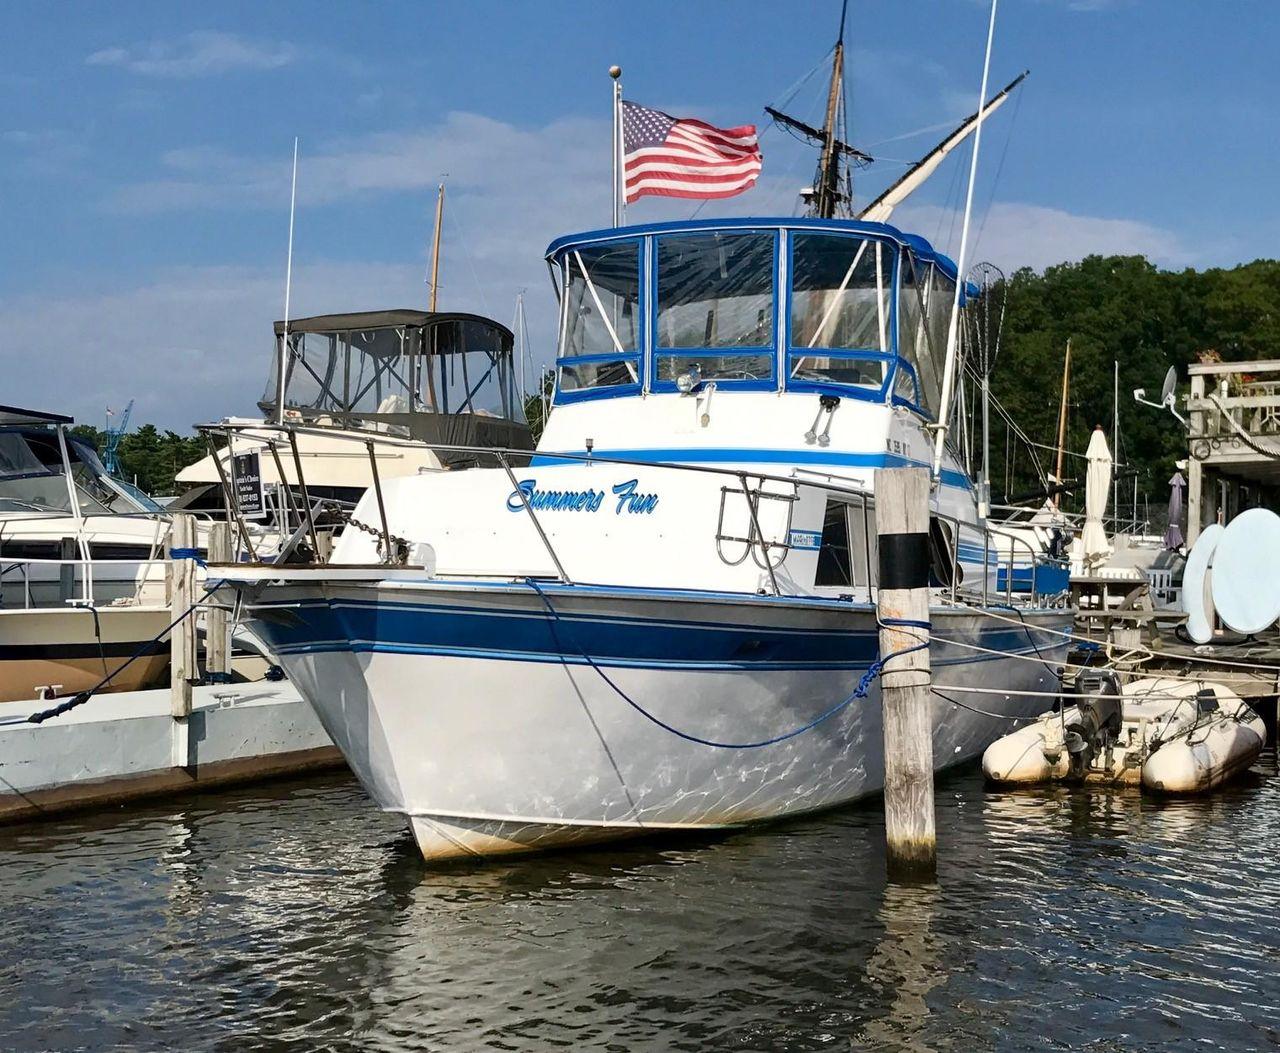 1984 Used Marinette 32 Fisherman Freshwater Fishing Boat For